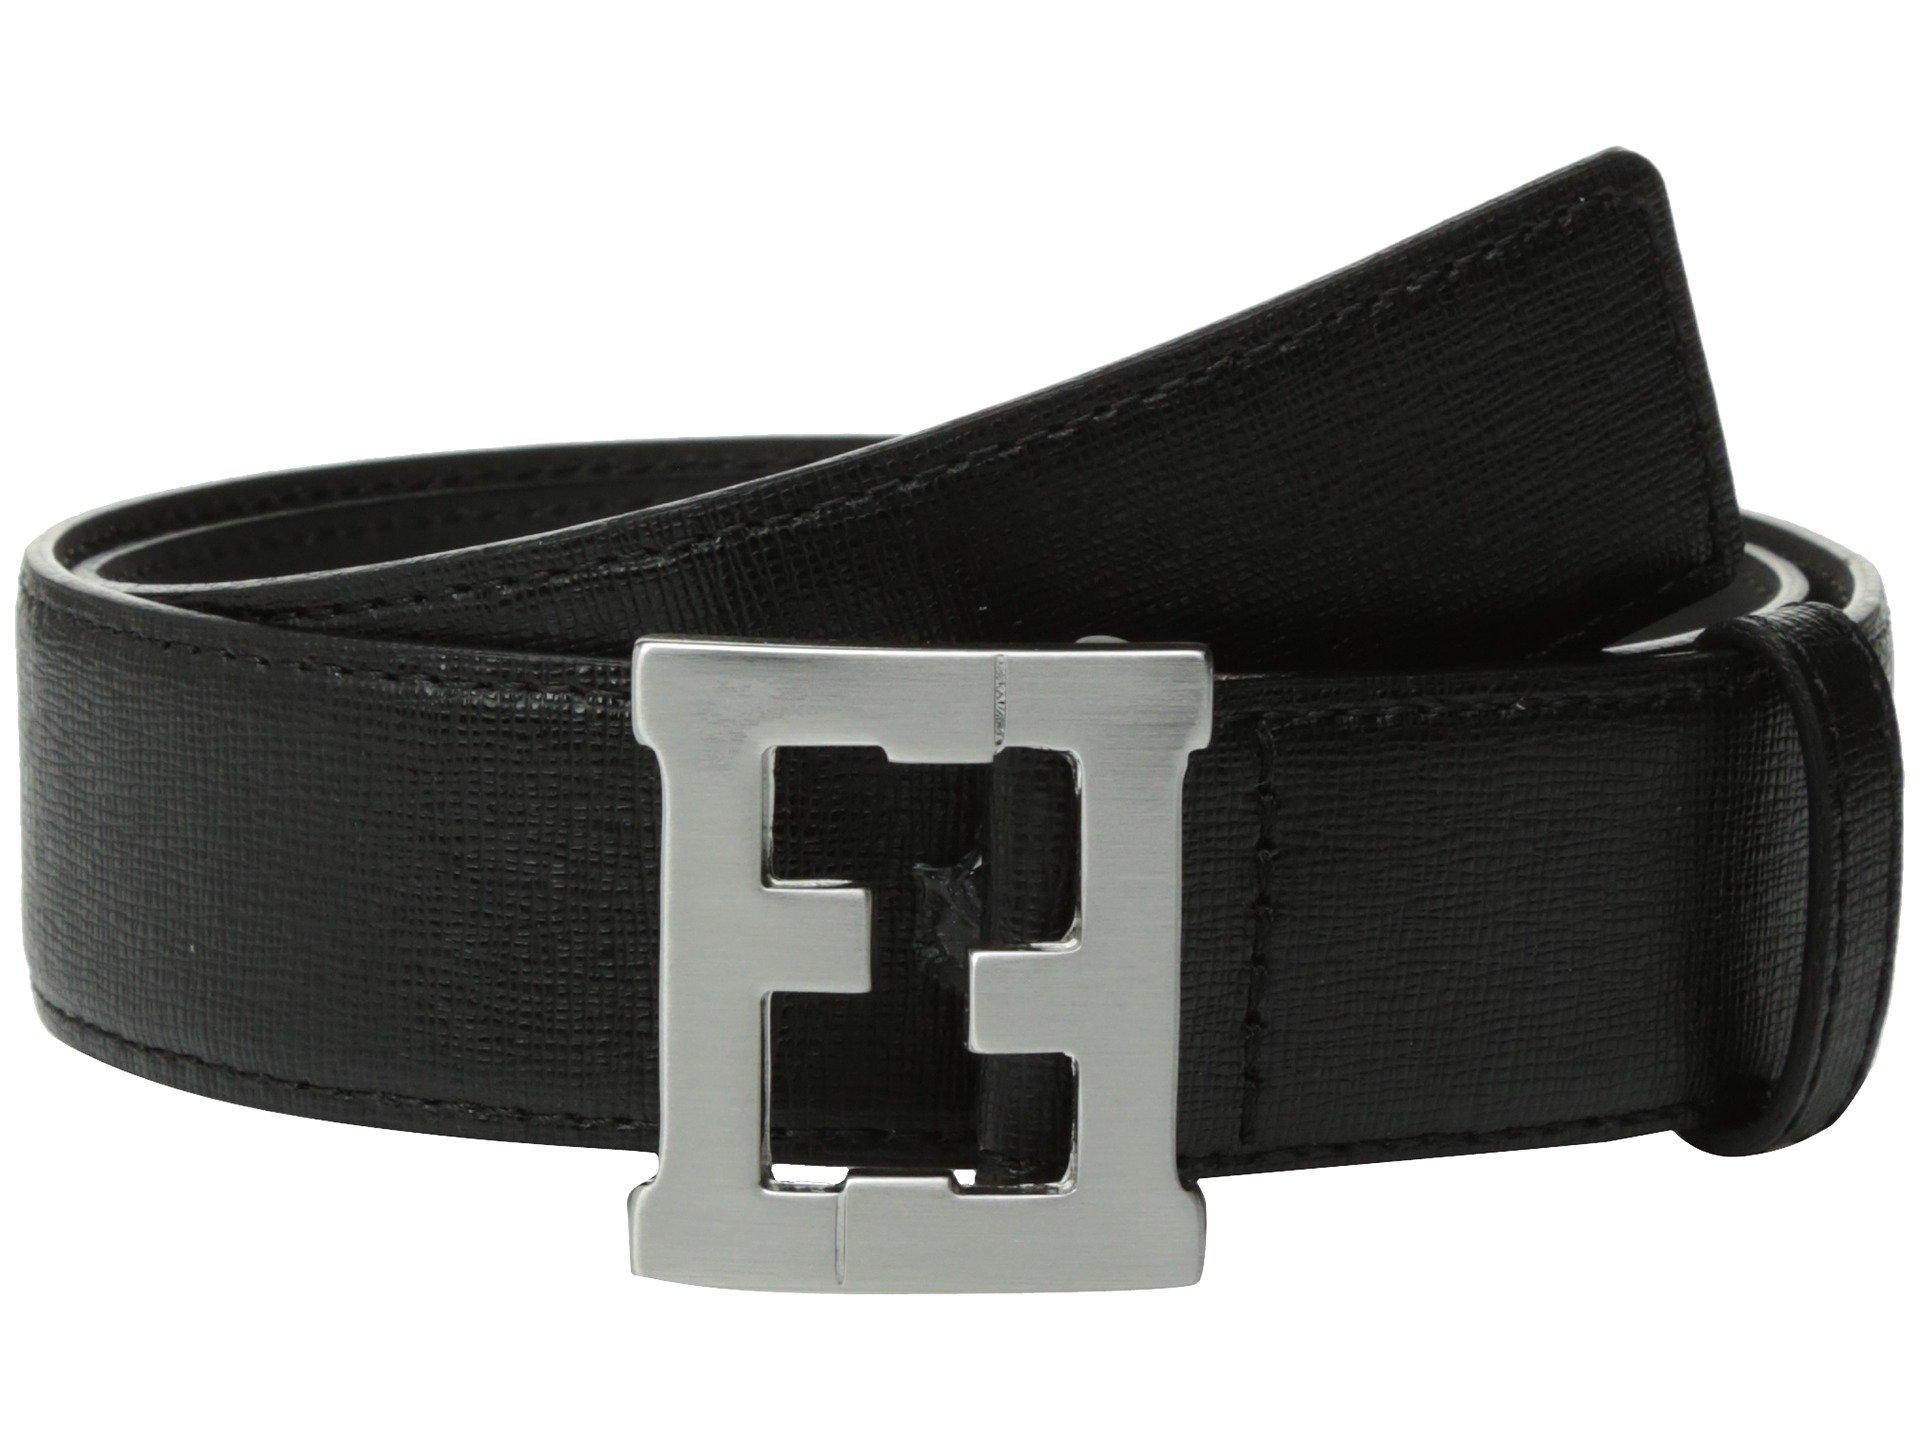 Cinturon para Niño Fendi Kids Logo Buckle Leather Belt (Toddler/Little Kids/Big Kids)  + Fendi Kids en VeoyCompro.net